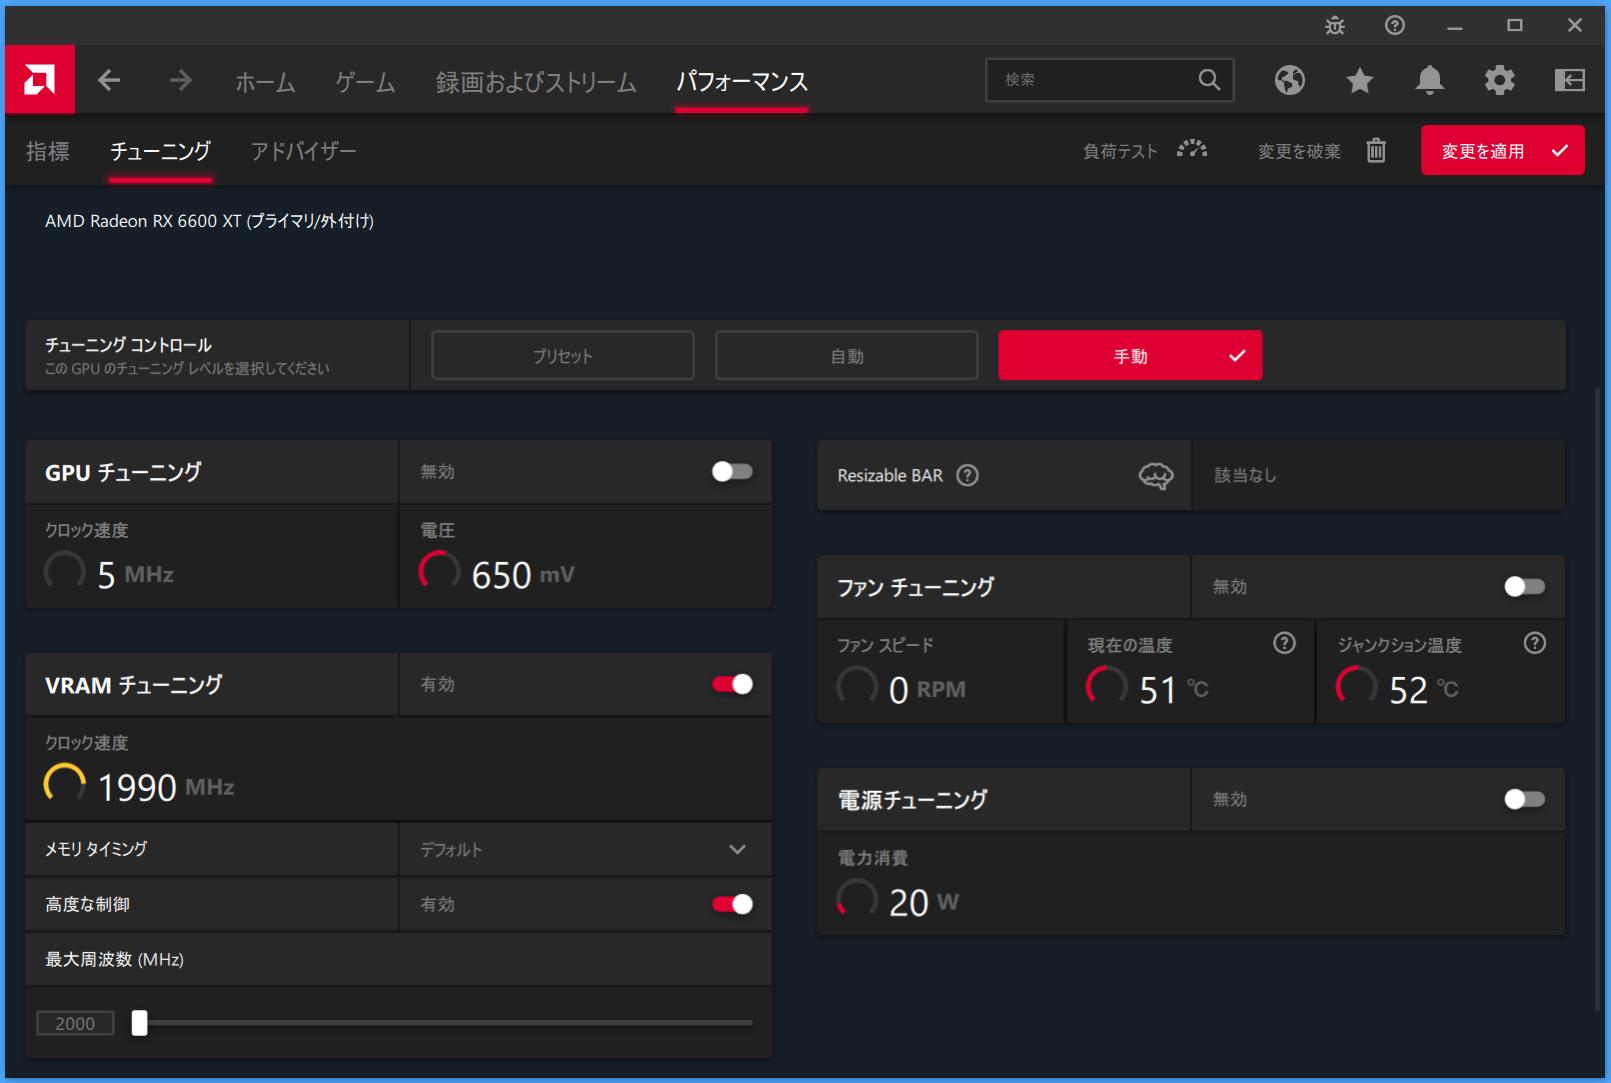 Radeon RX 6600 XT_Radeon-Setting_5_VRAM-Clock